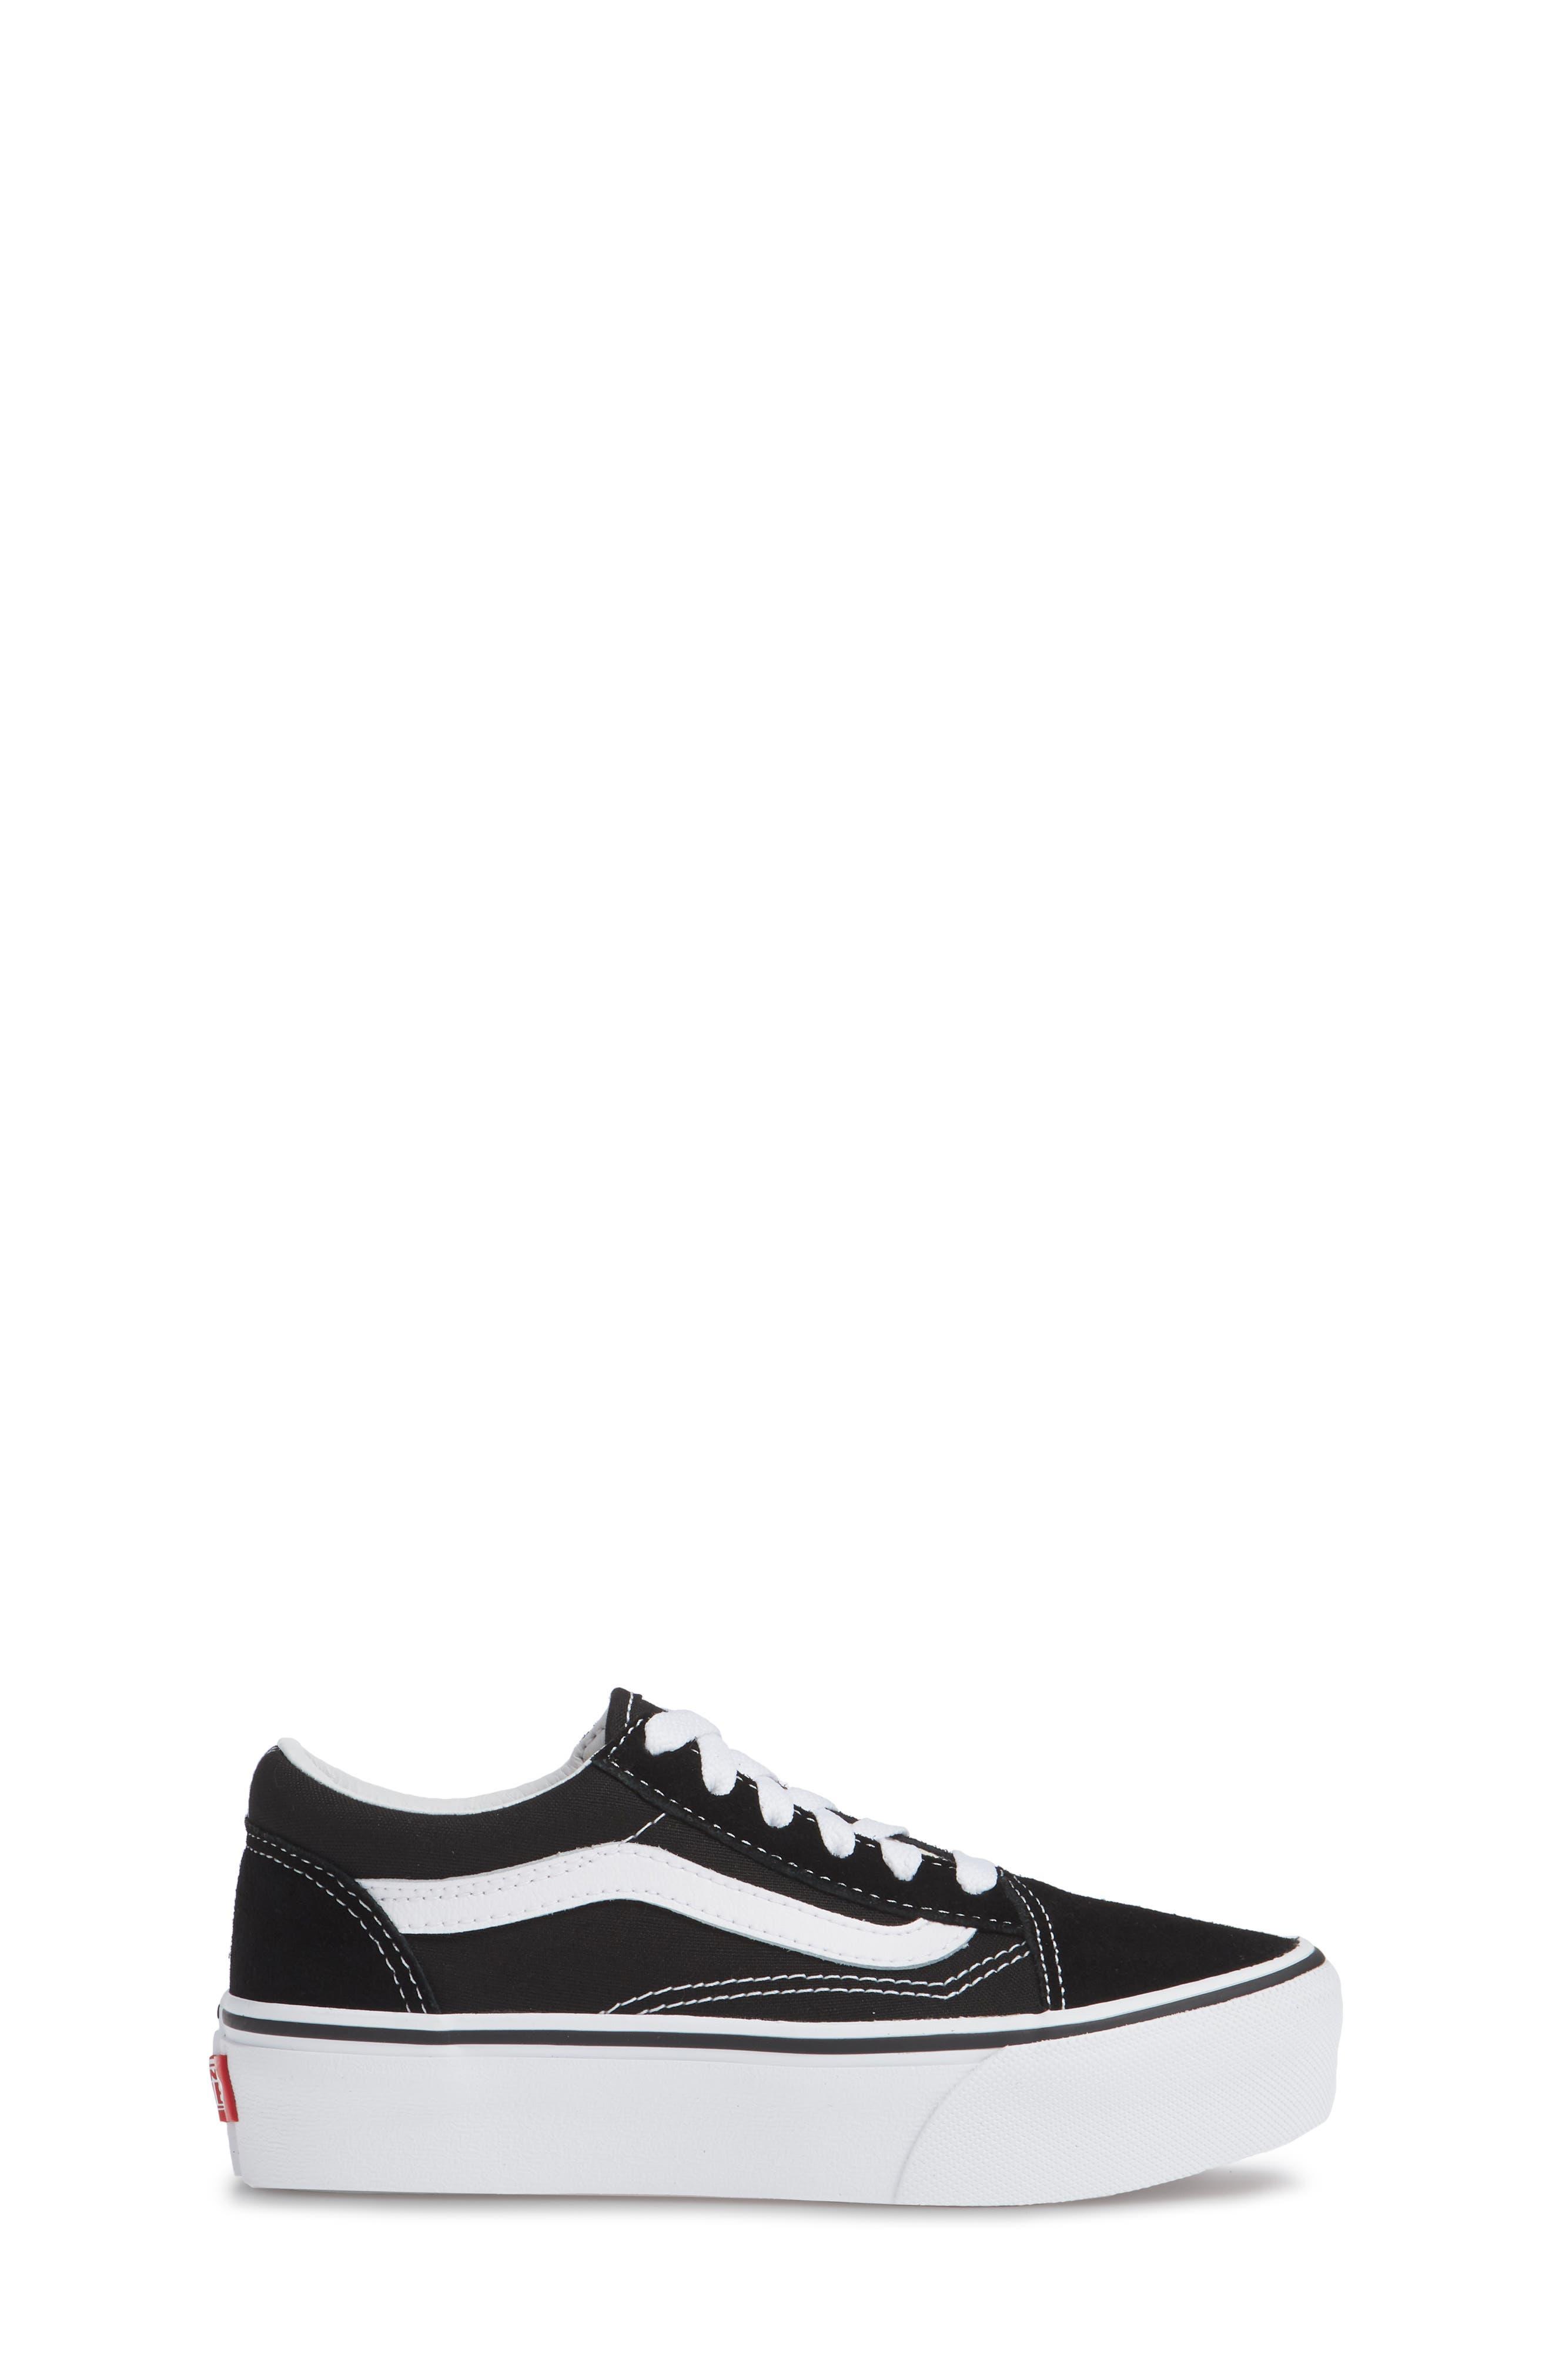 VANS, Old Skool Platform Sneaker, Alternate thumbnail 3, color, BLACK/ TRUE WHITE